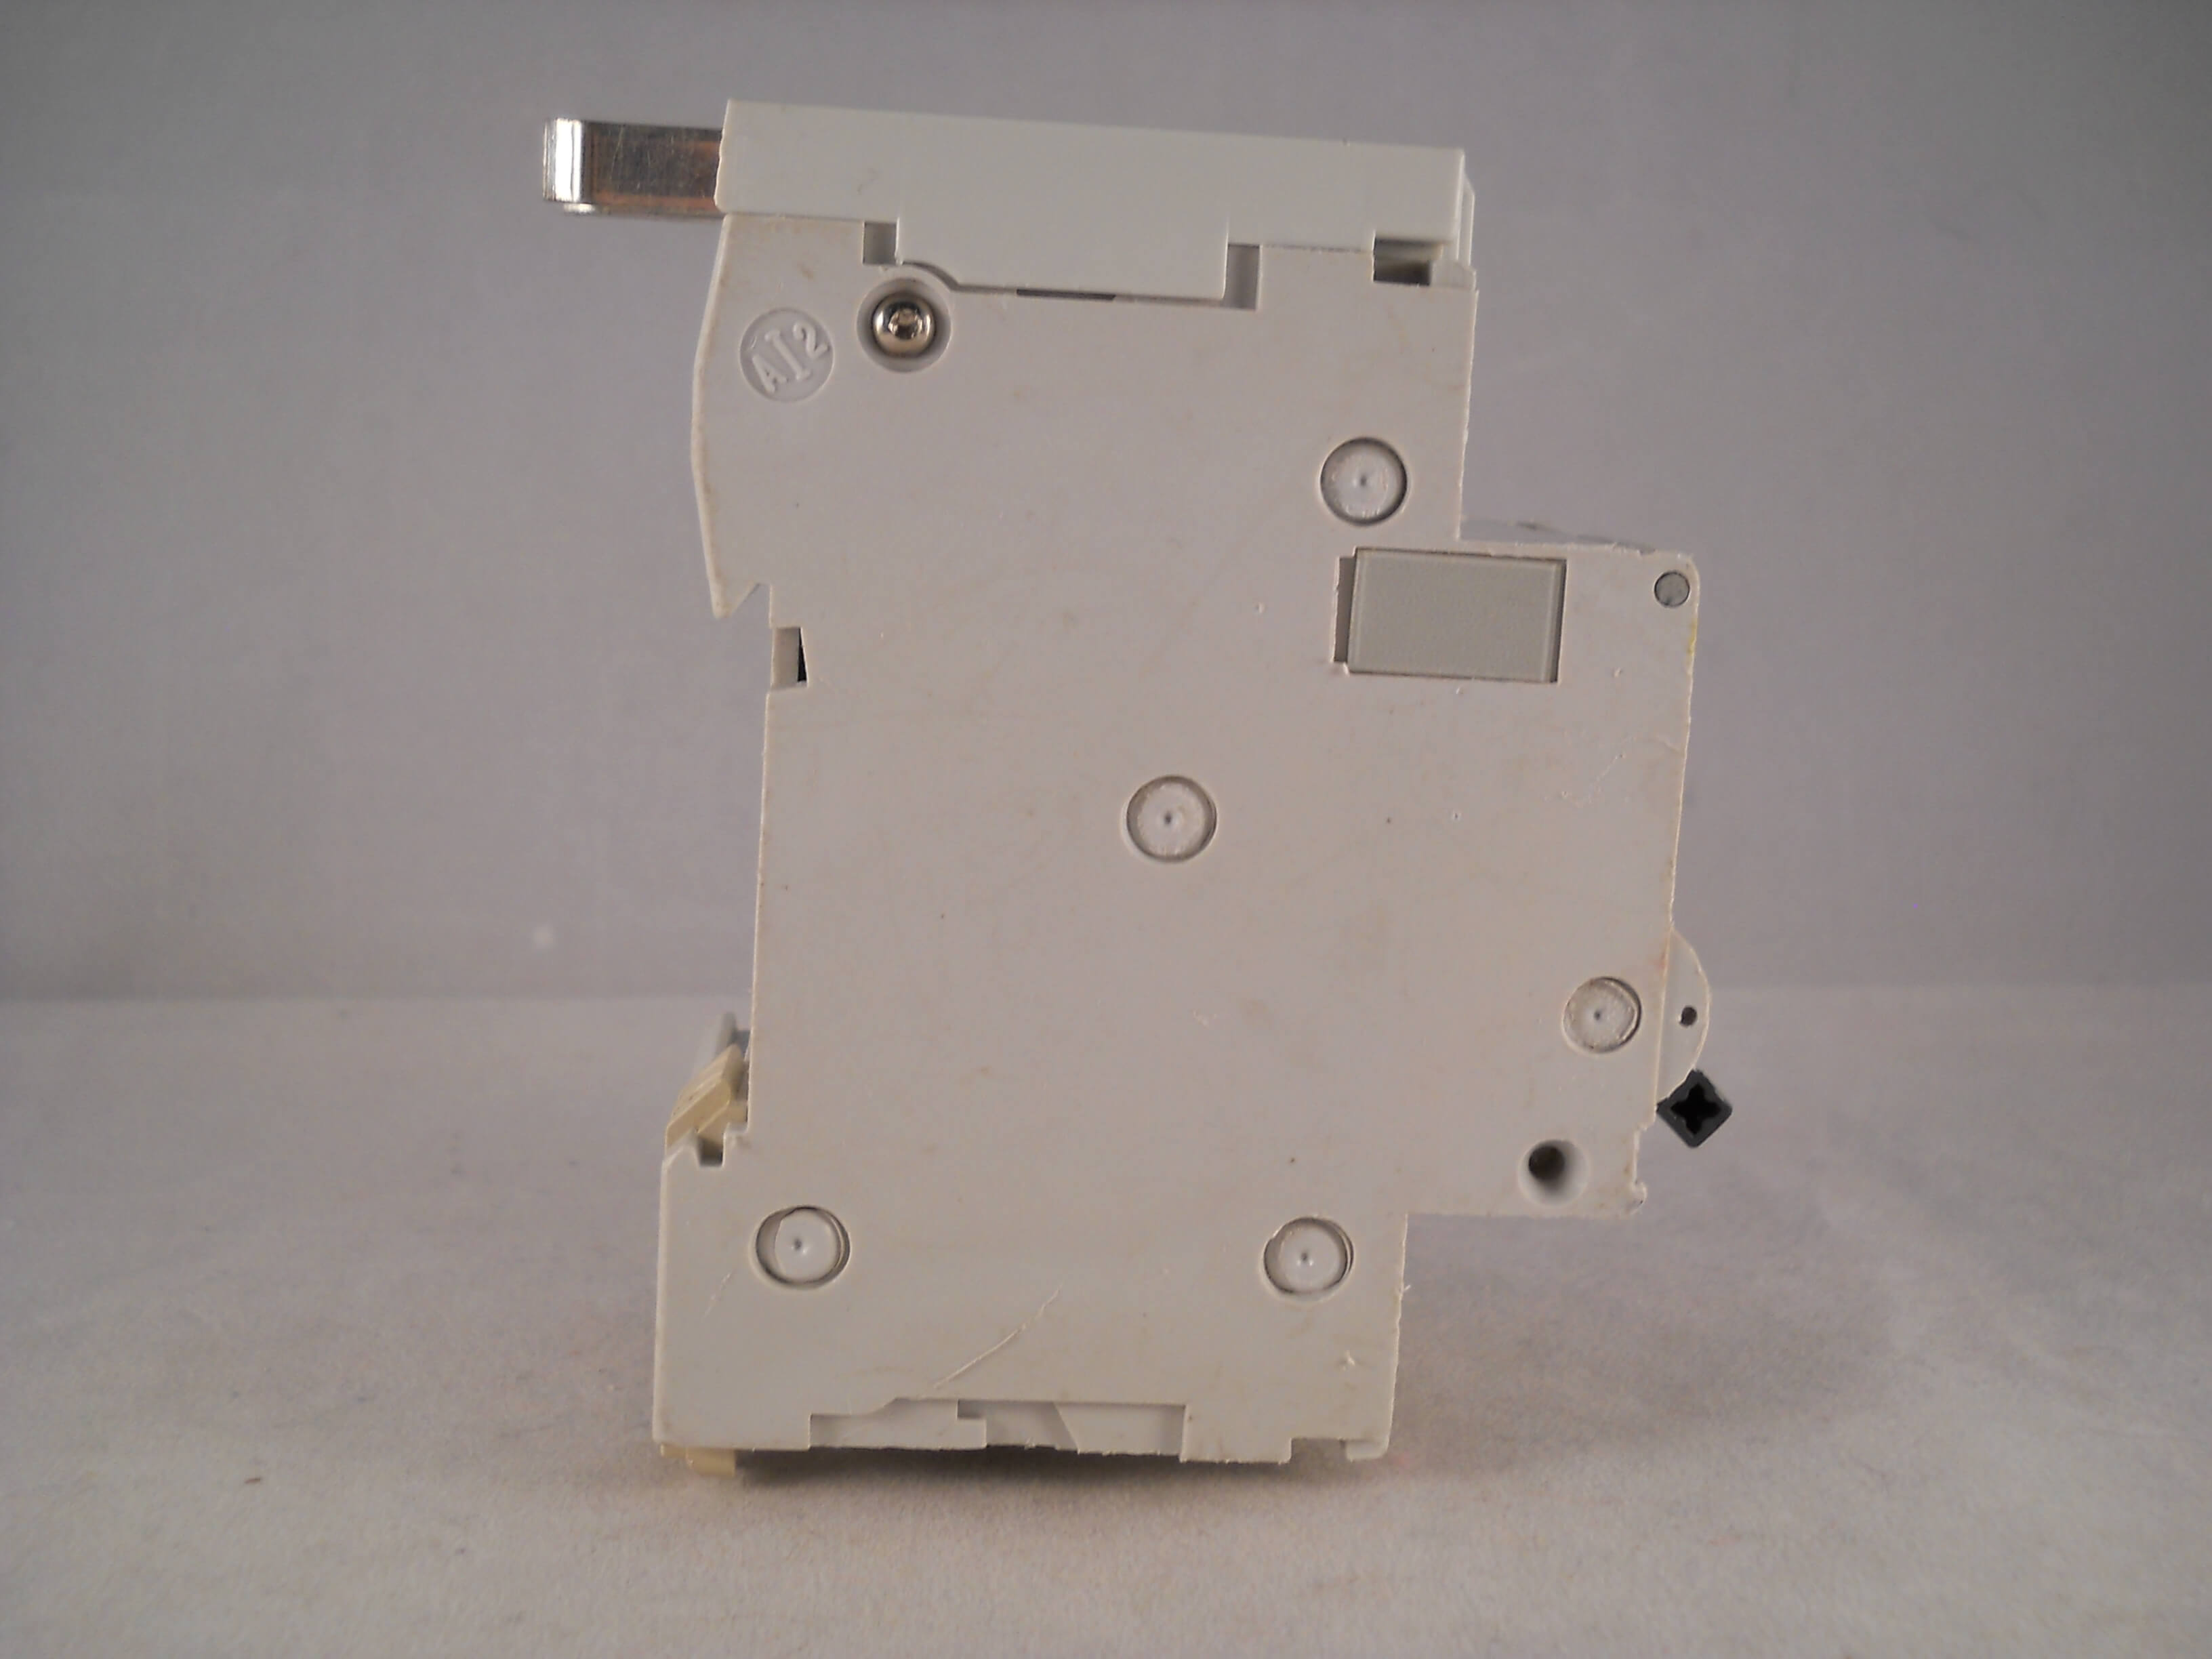 Qwikline Fuse Box : Quickline universal fuse box repair wiring scheme